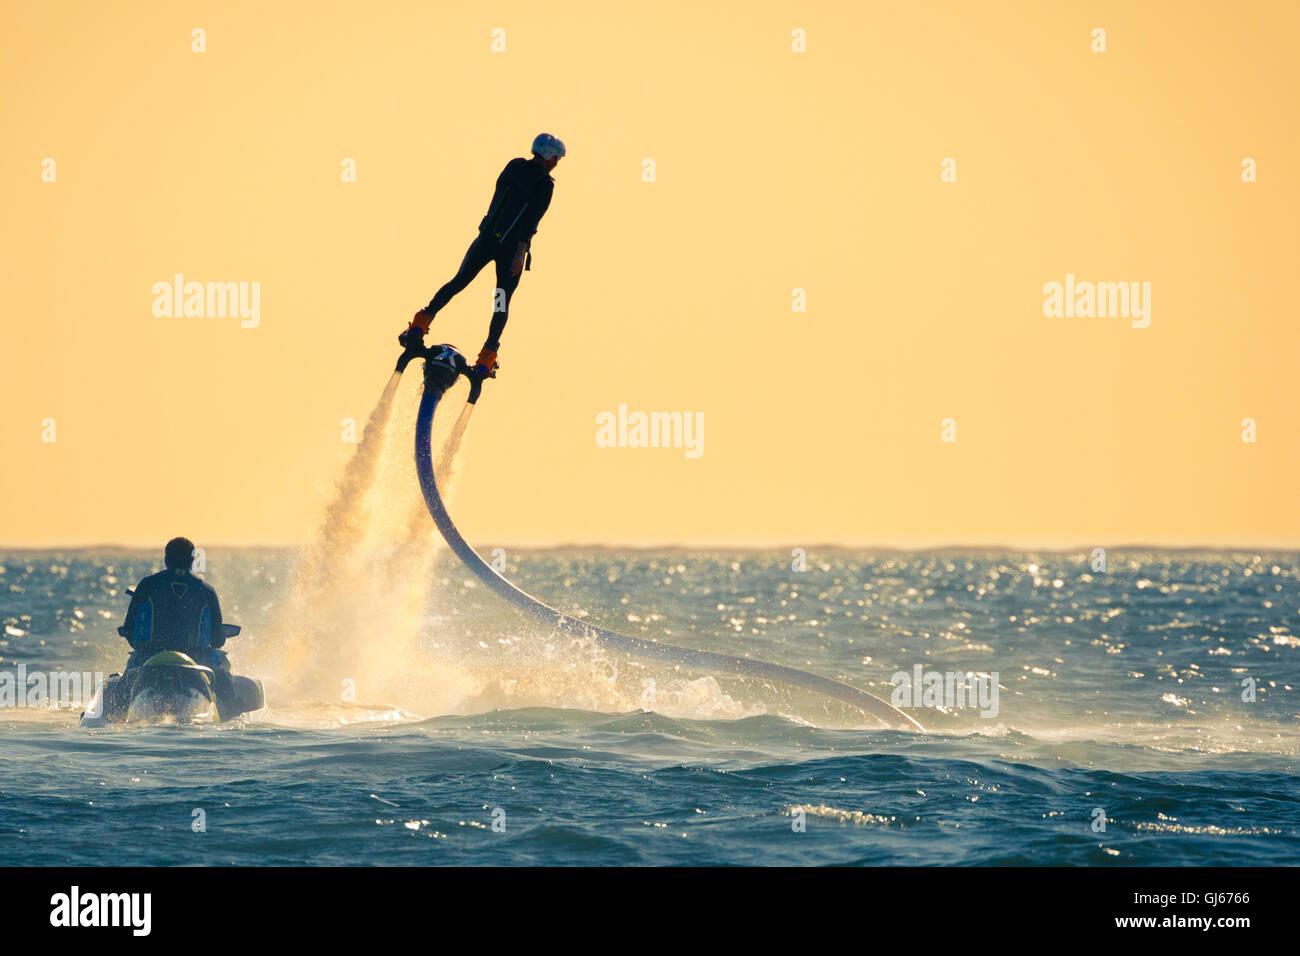 A hydro jet surfer soars over the Pacific Ocean near Maviri Beach, Sinaloa, Mexico. - Stock Image